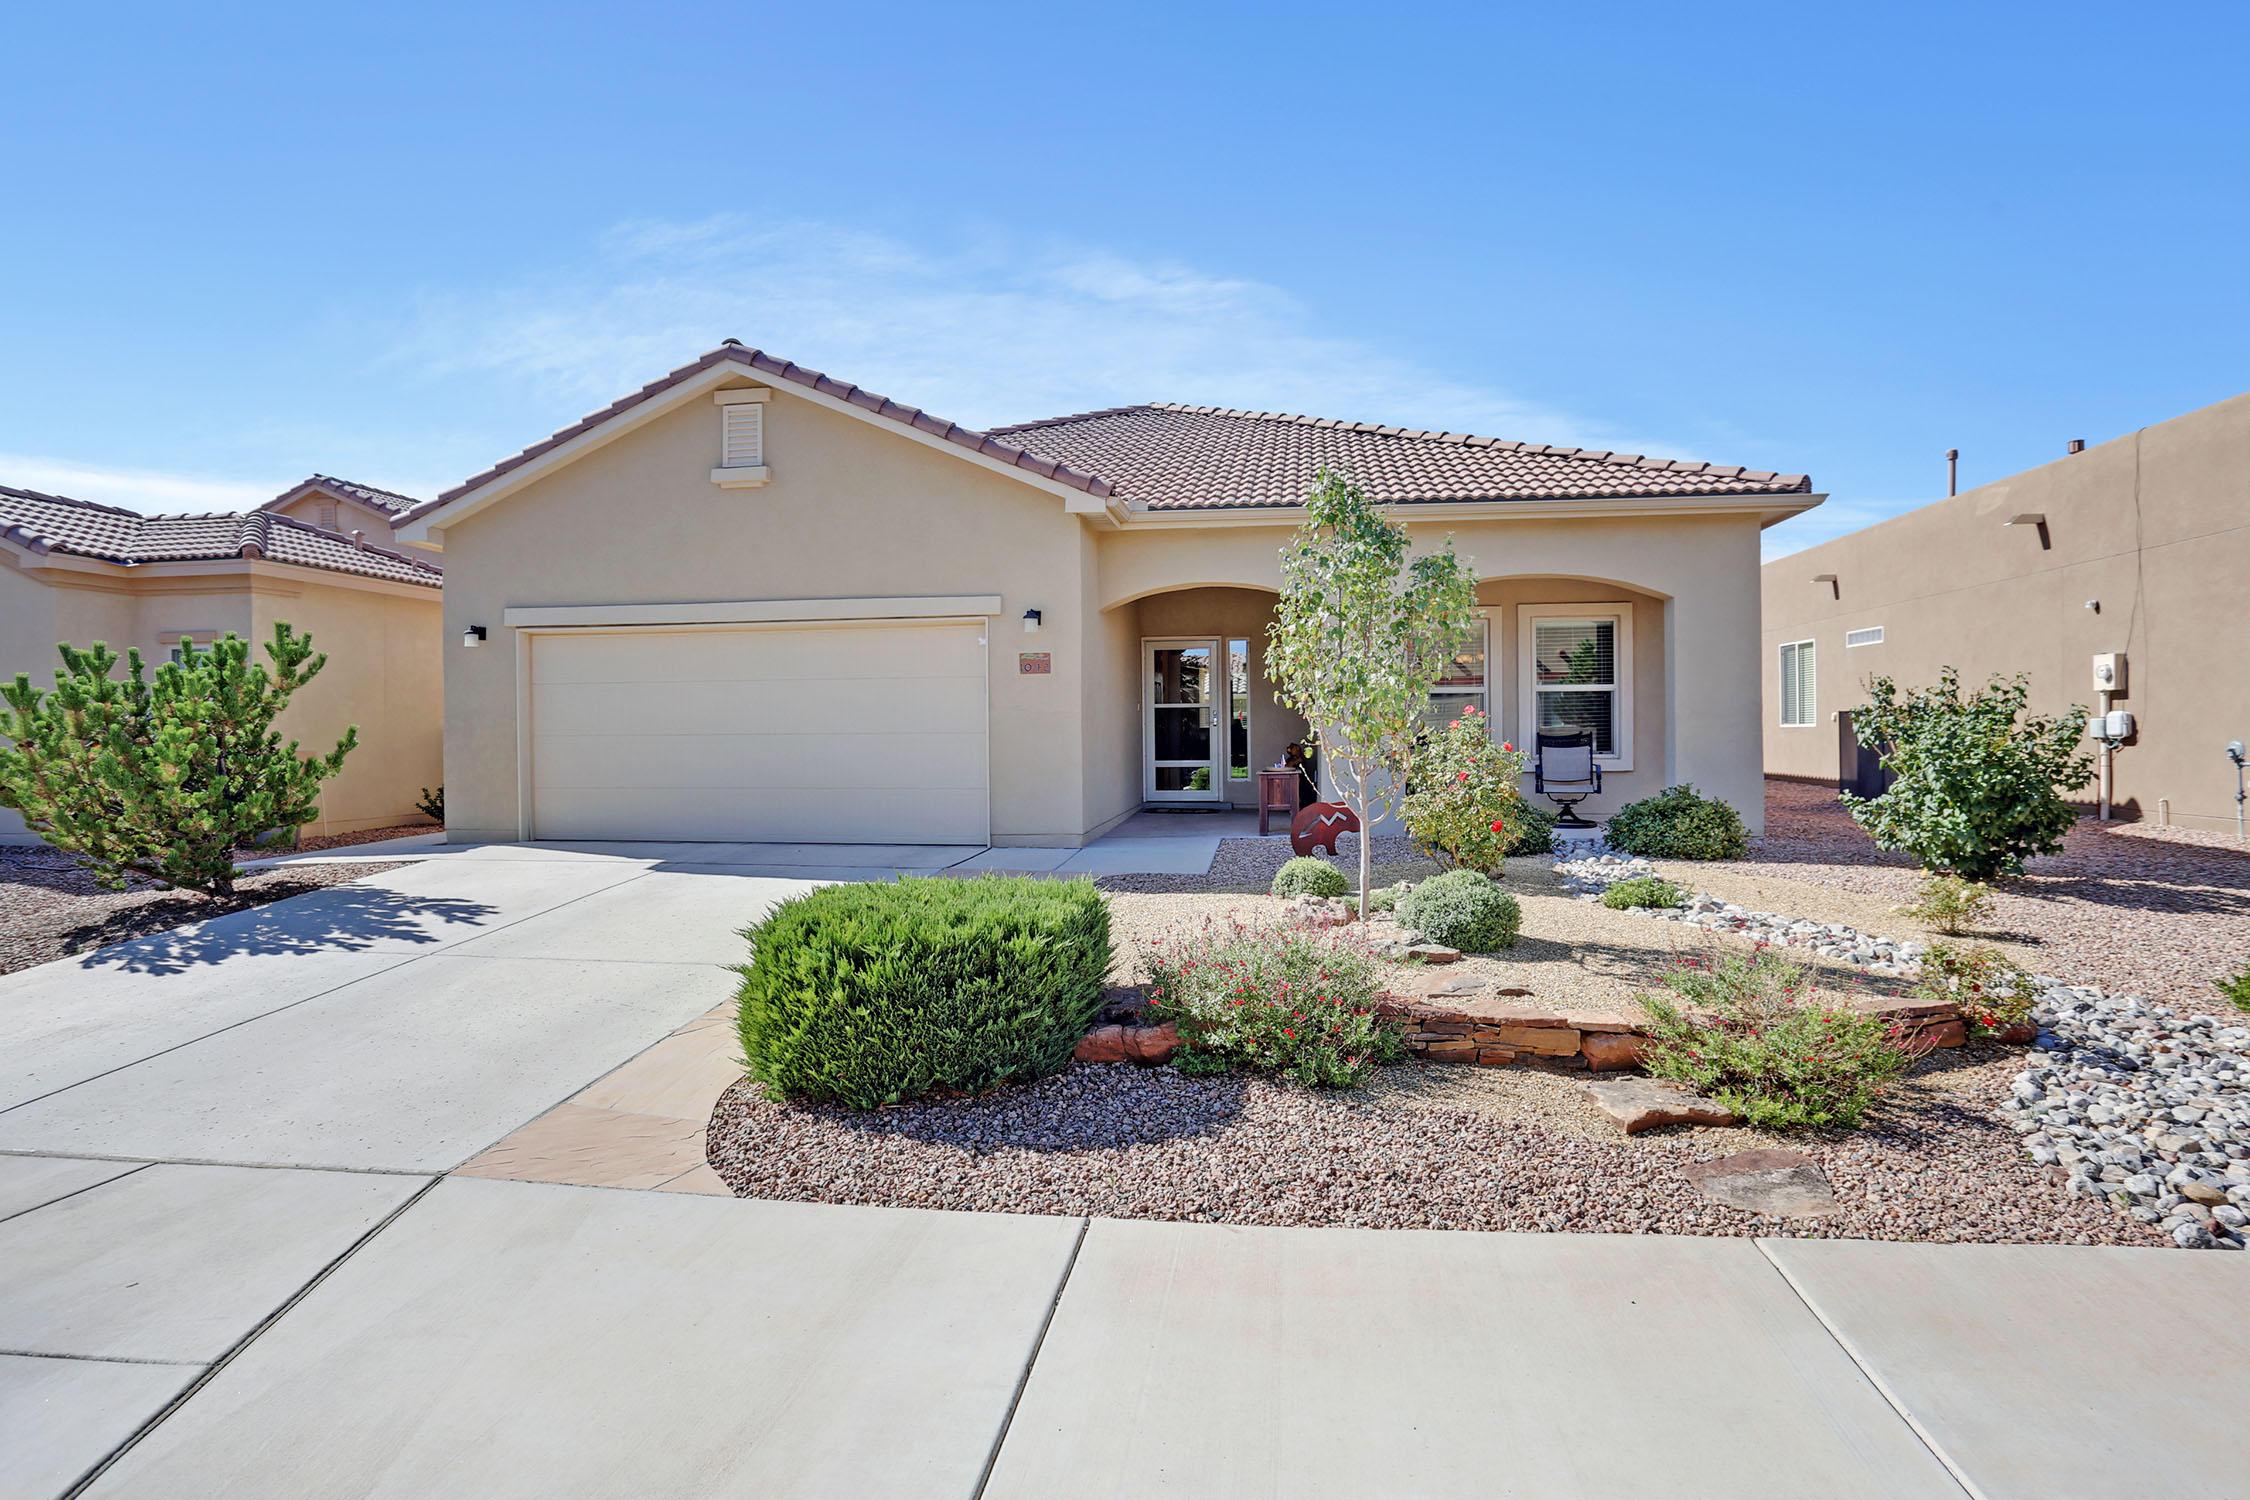 1042 Golden Yarrow,Bernalillo,New Mexico,United States 87004,3 Bedrooms Bedrooms,3 BathroomsBathrooms,Residential,Golden Yarrow,927353